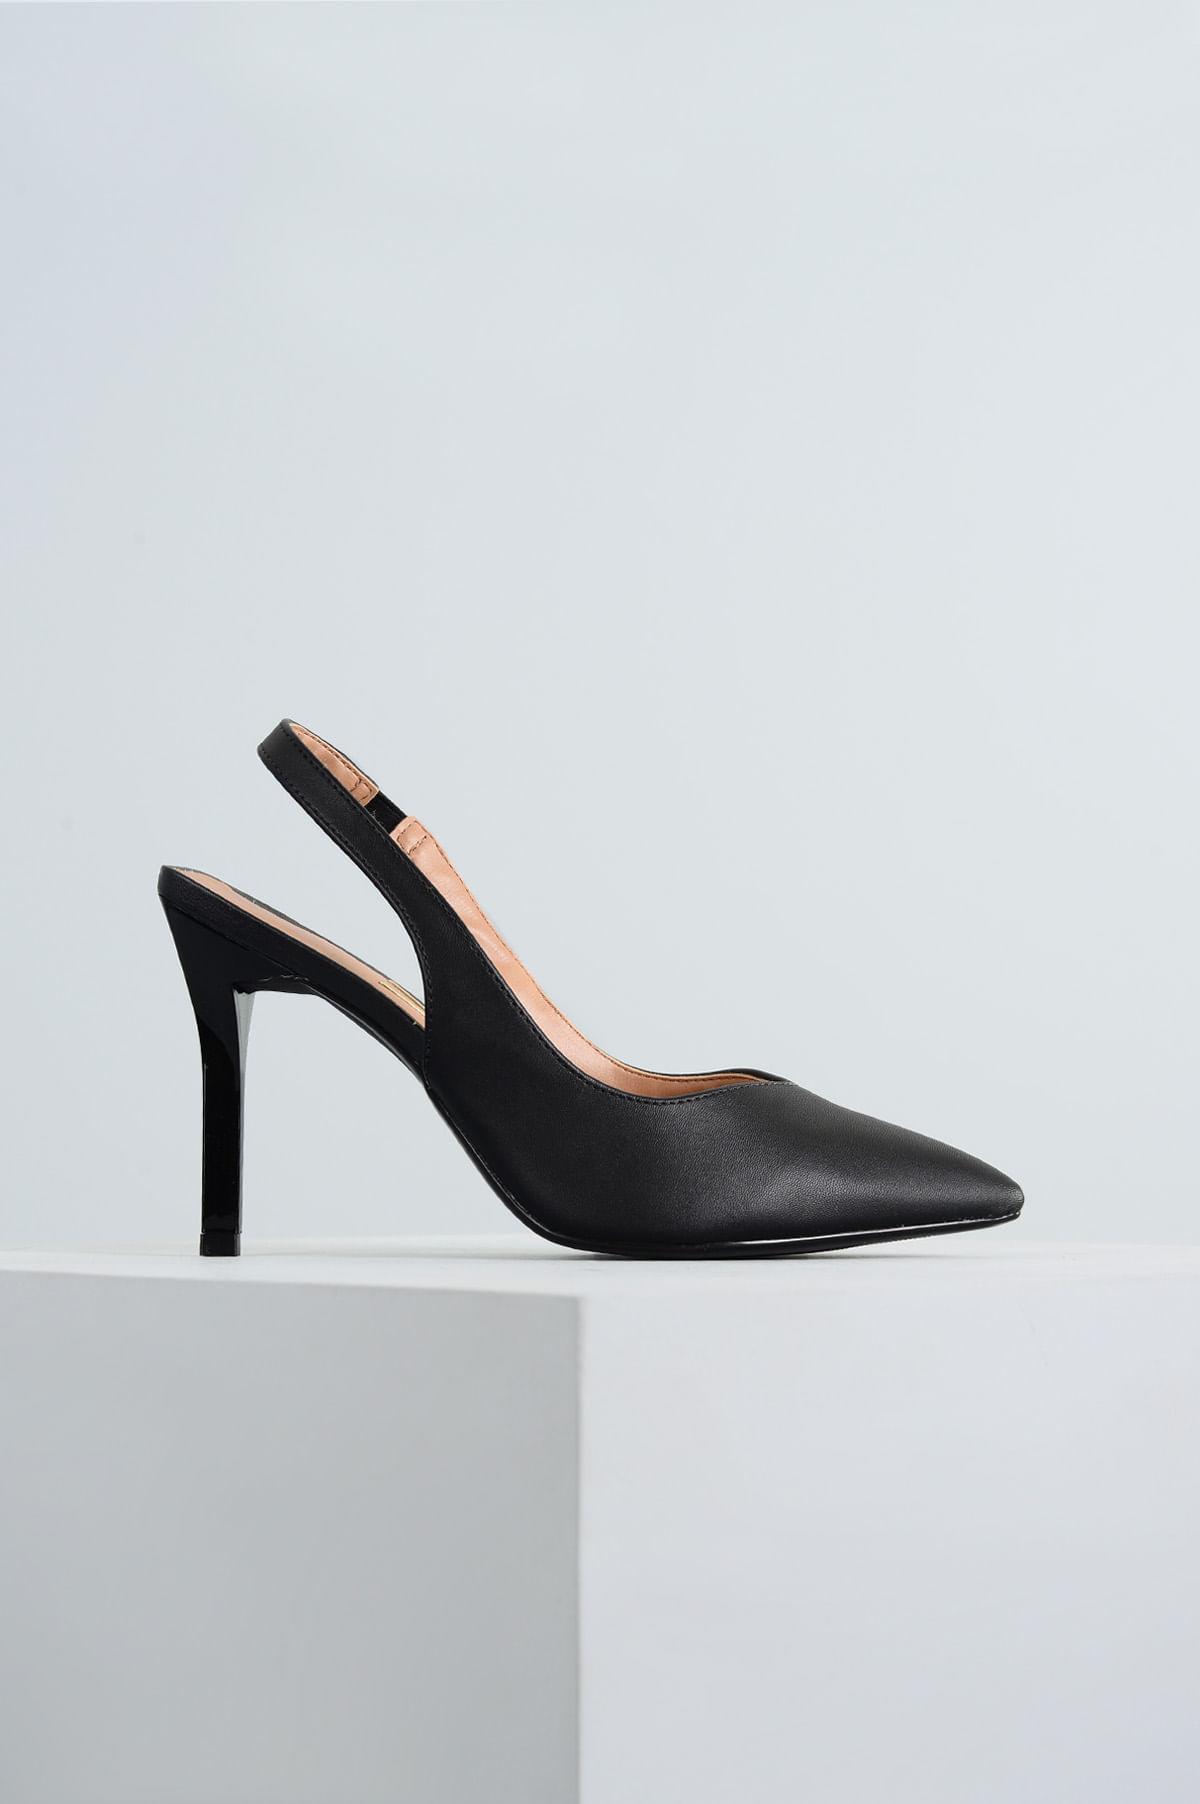 862be22395 Sapato Salto Alto Ingridi Vizzano SINT - PRETO - Mundial Calçados